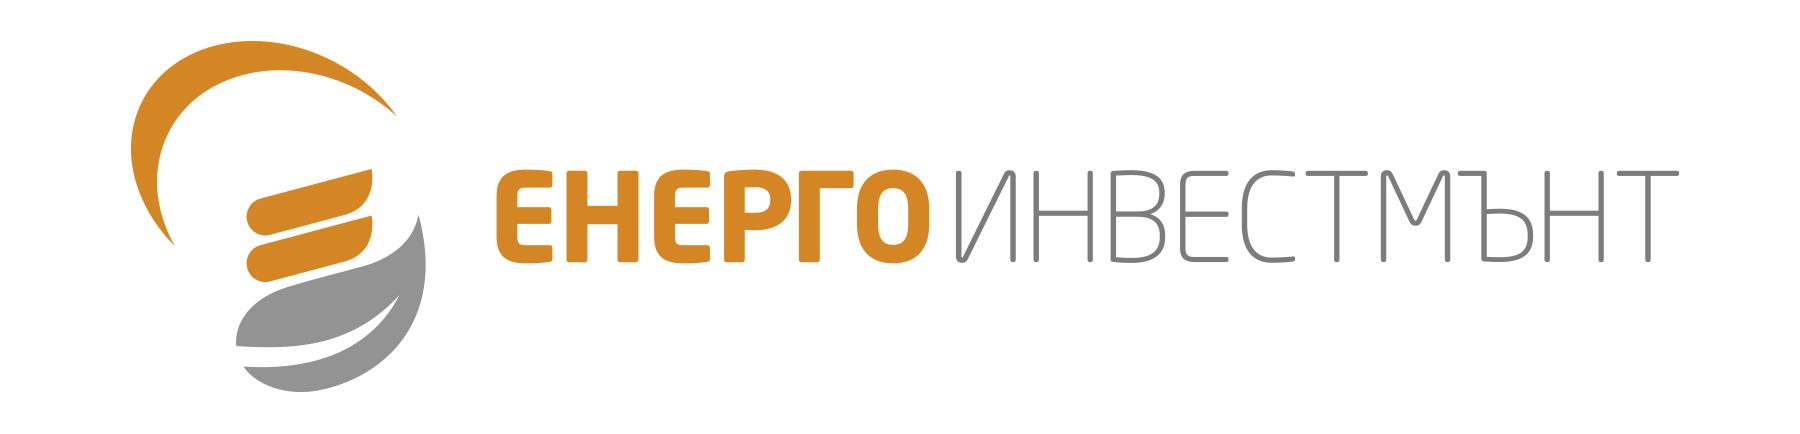 графичен знак и логотип. ЕНЕРГОИНВЕСТМЪНТ.